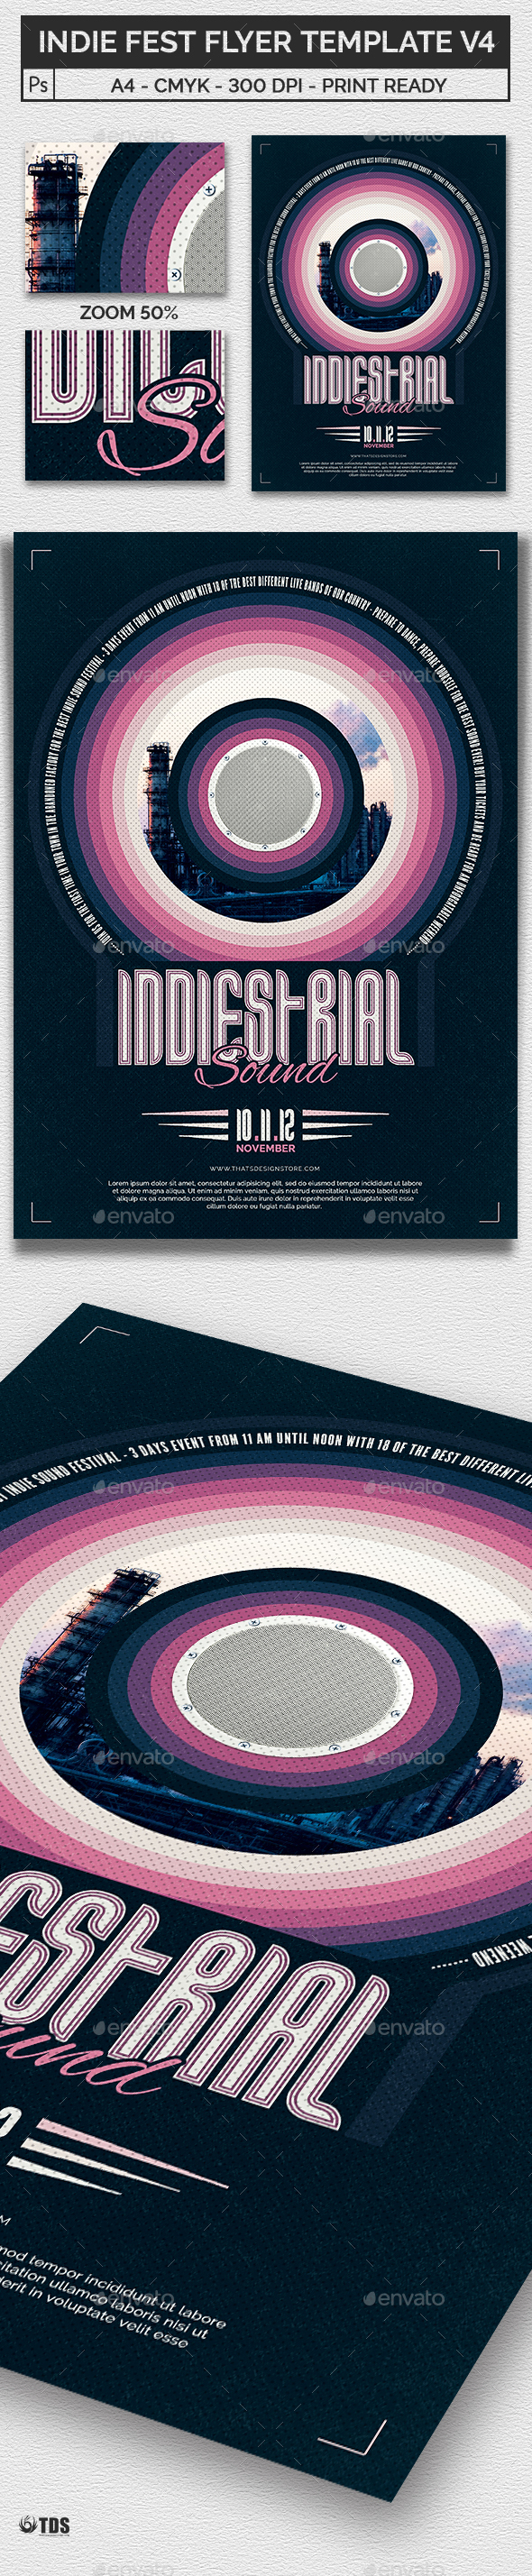 Indie Fest Flyer Template V4 - Concerts Events